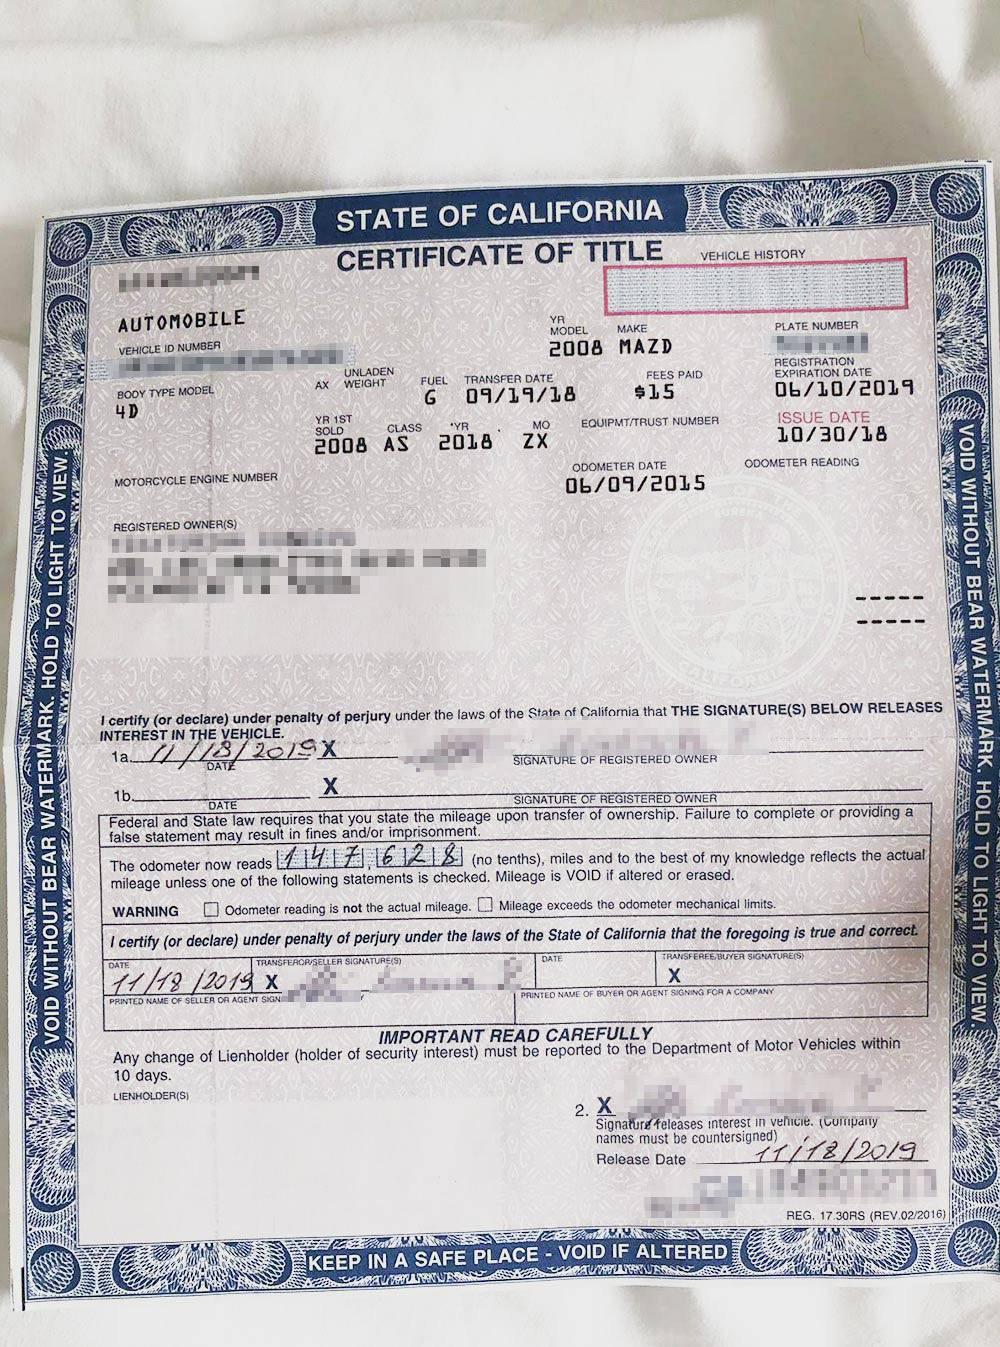 Certificate of title — аналог ПТС — на машину, который отдал мне продавец